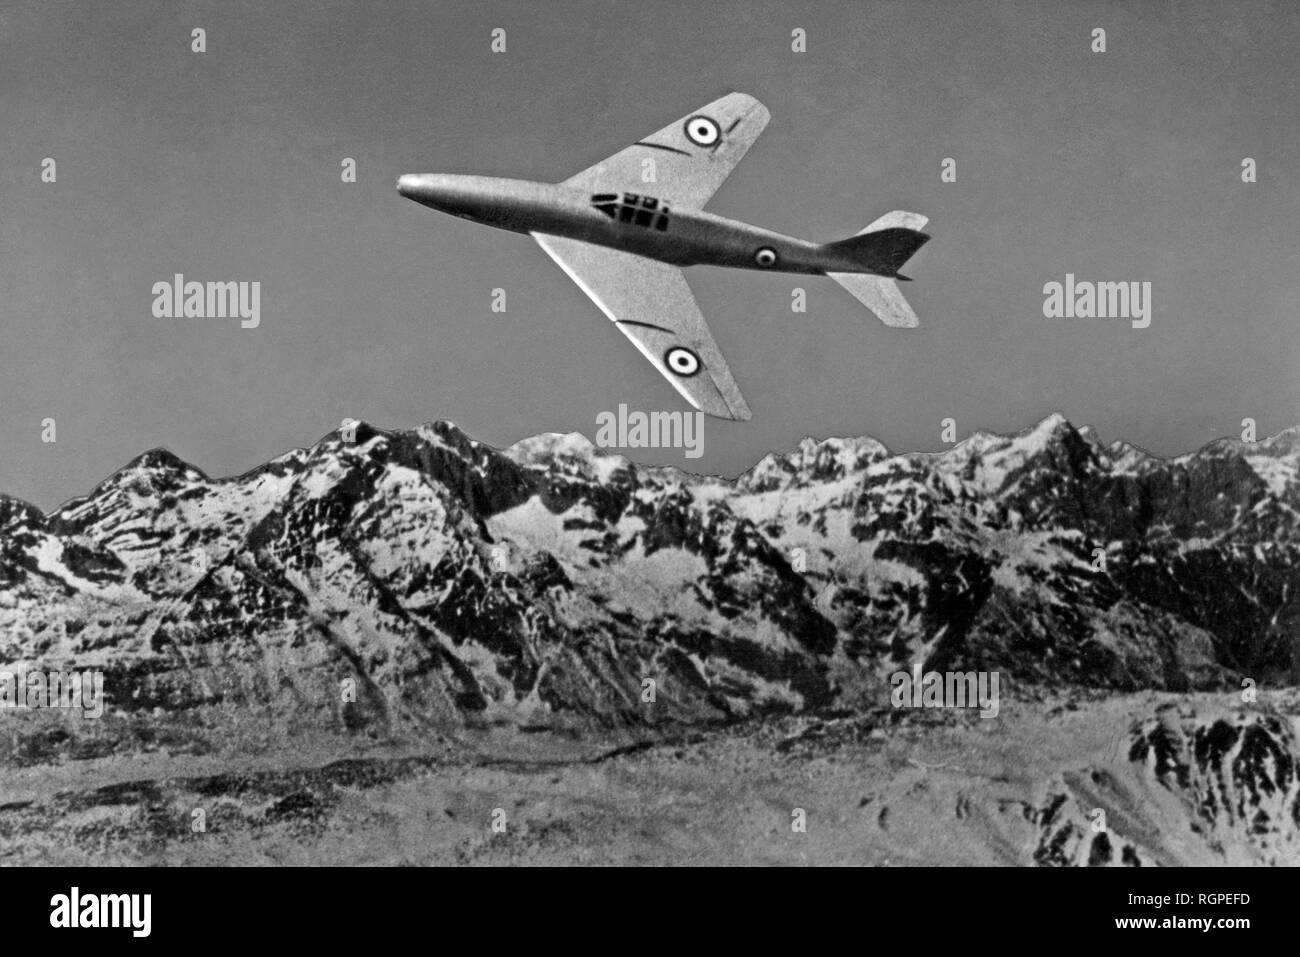 warplane ambrosini sagittario, 1953 - Stock Image